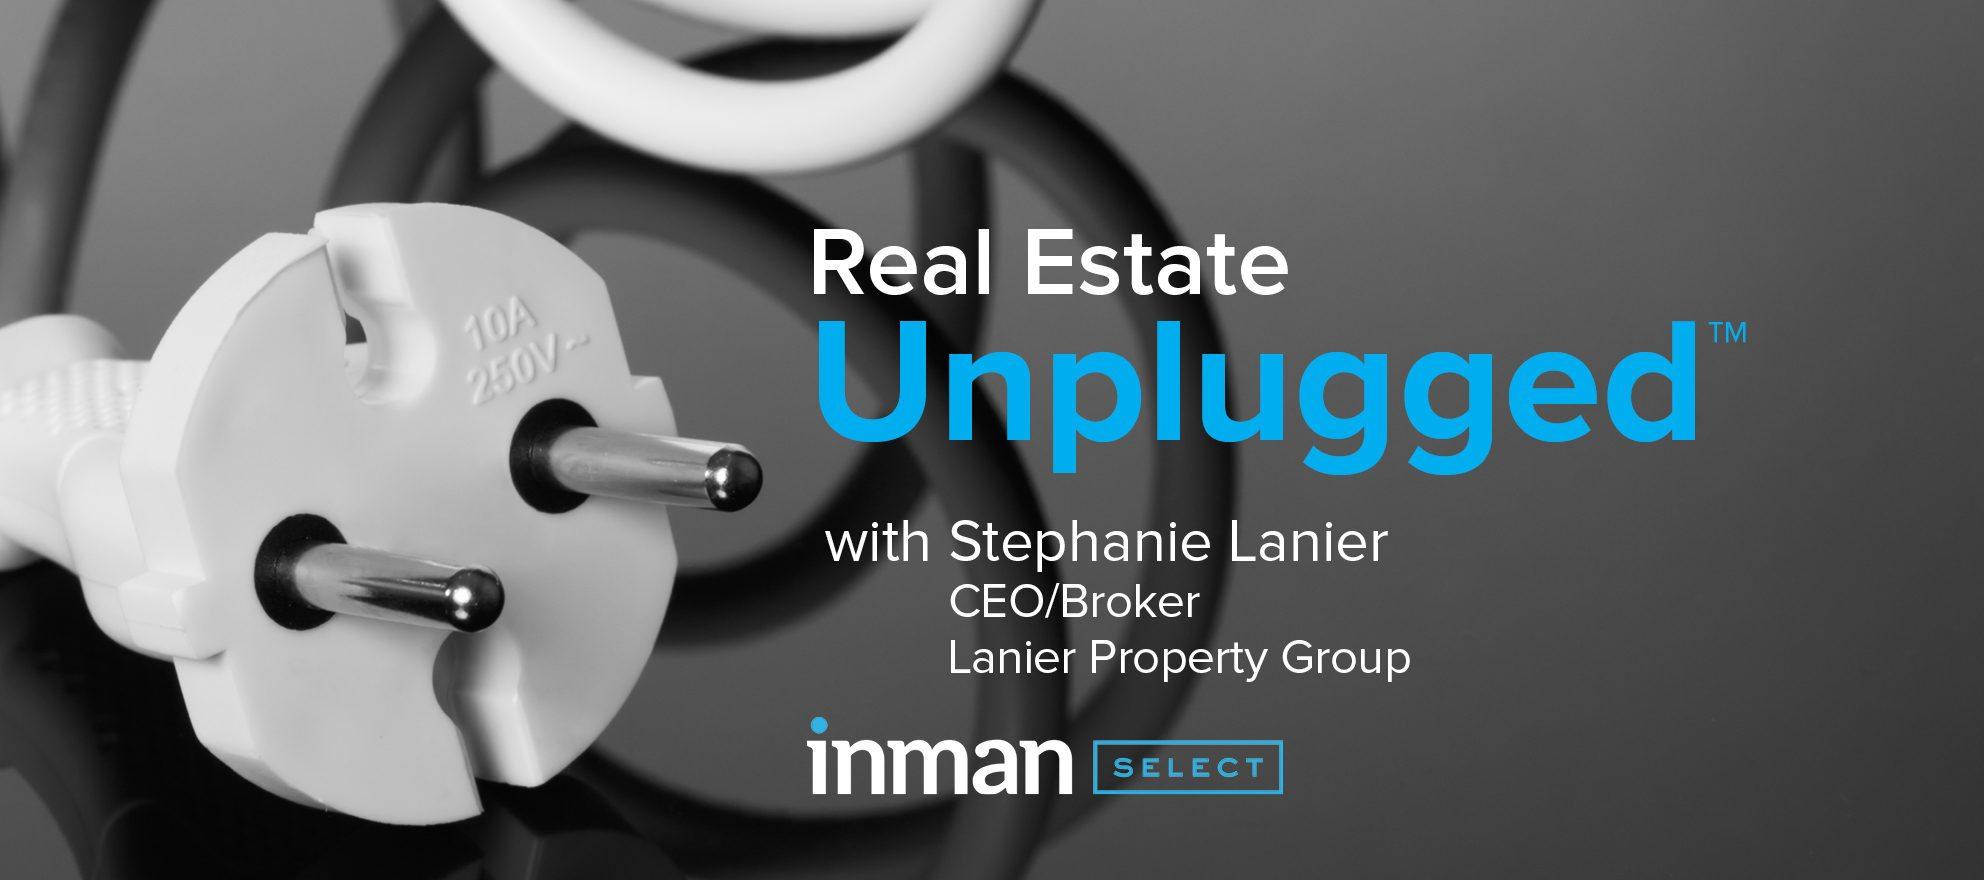 Stephanie Lanier on culture, creativity and a fair compensation model